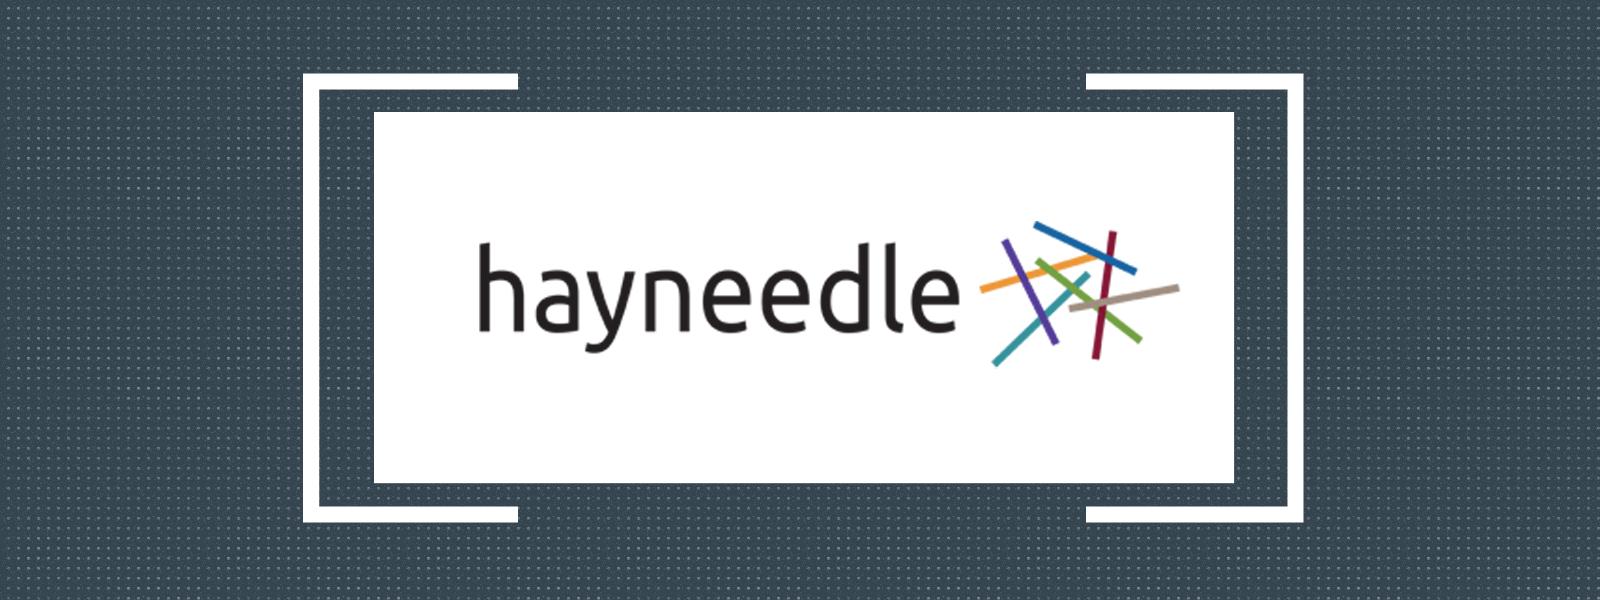 hayneedle integration